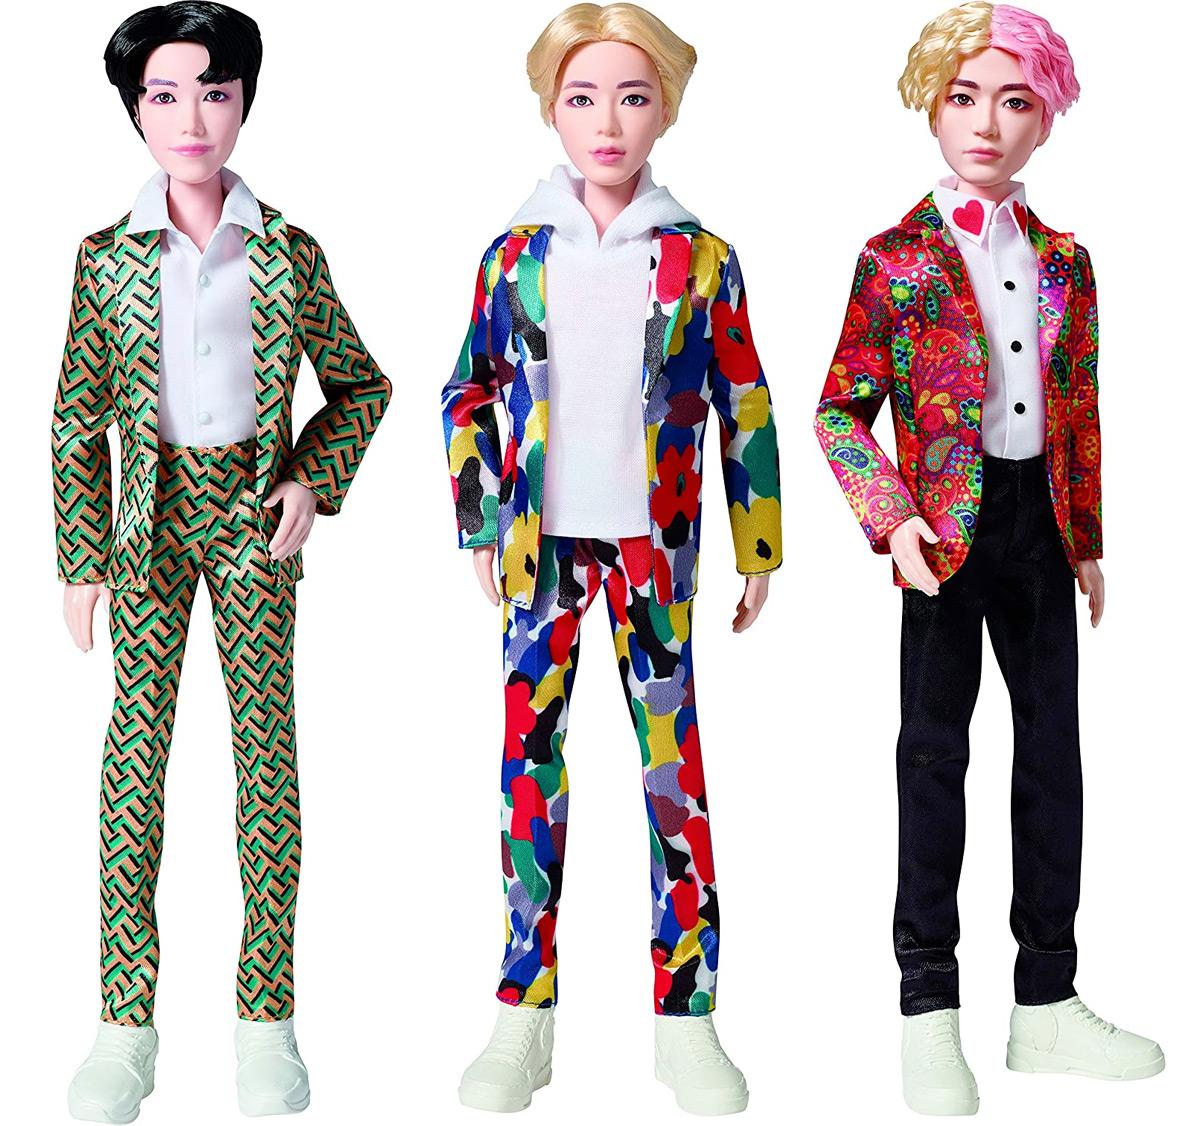 j-Hope, Jin, and V dolls from Bangtan Boys K-pop group